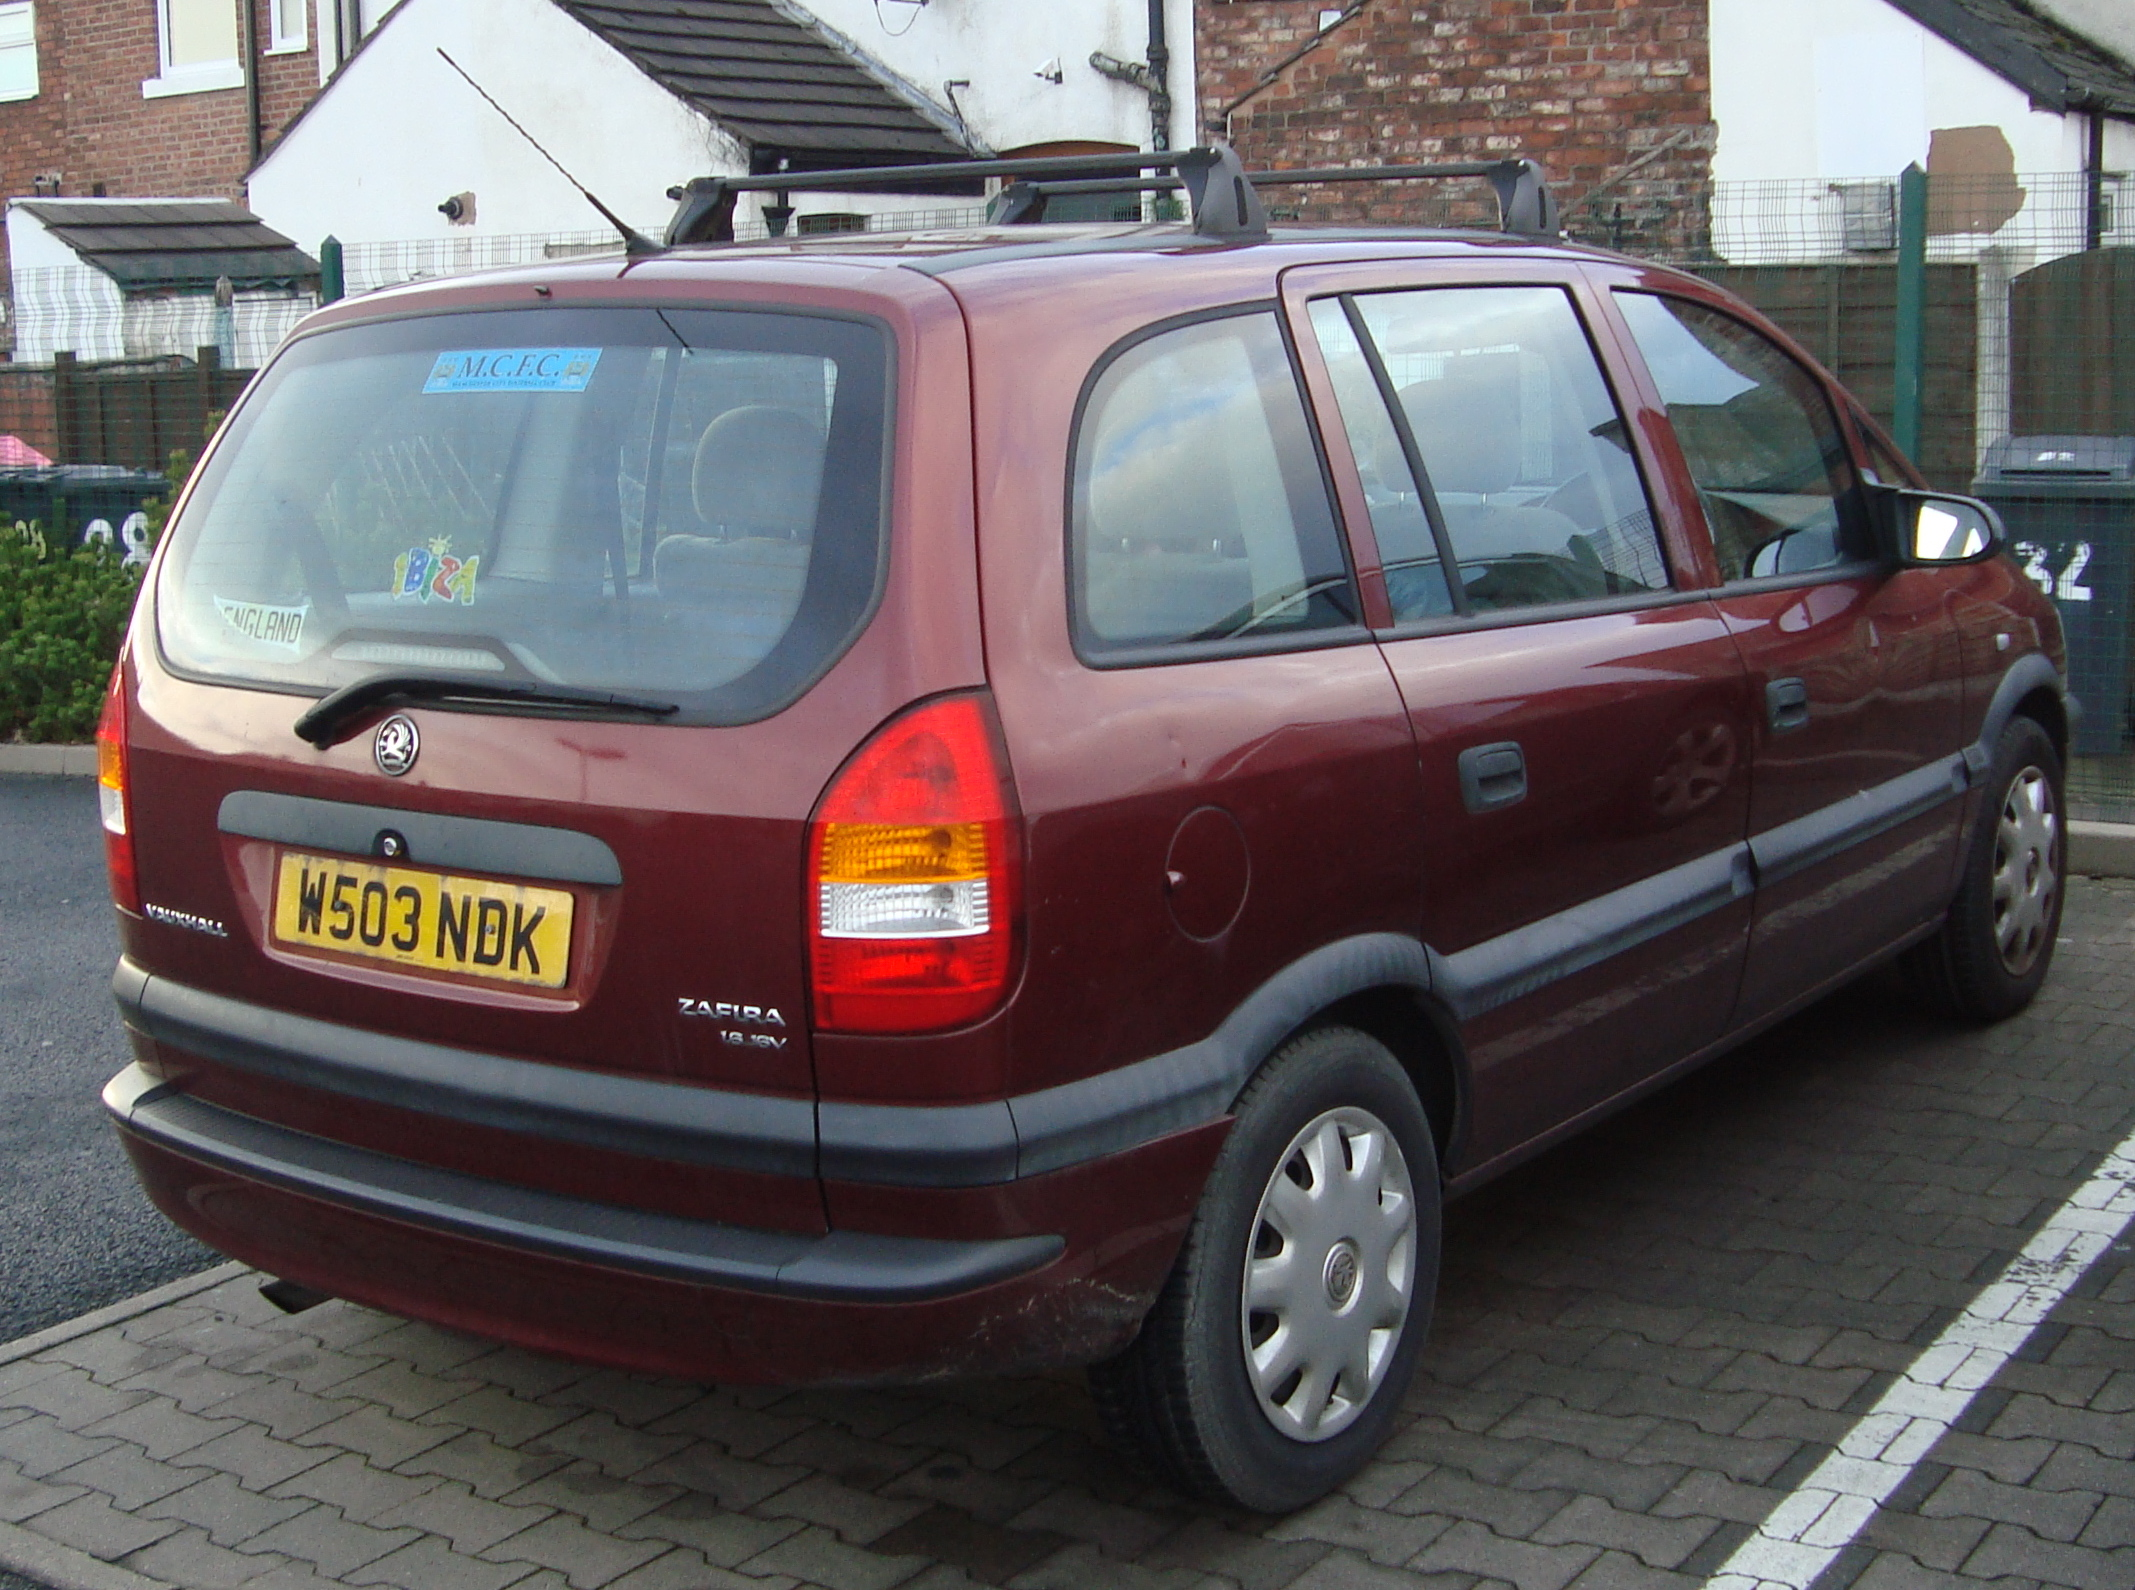 File:2000 Vauxhall Zafira 1.6 Club (16130939166).jpg - Wikimedia Commons